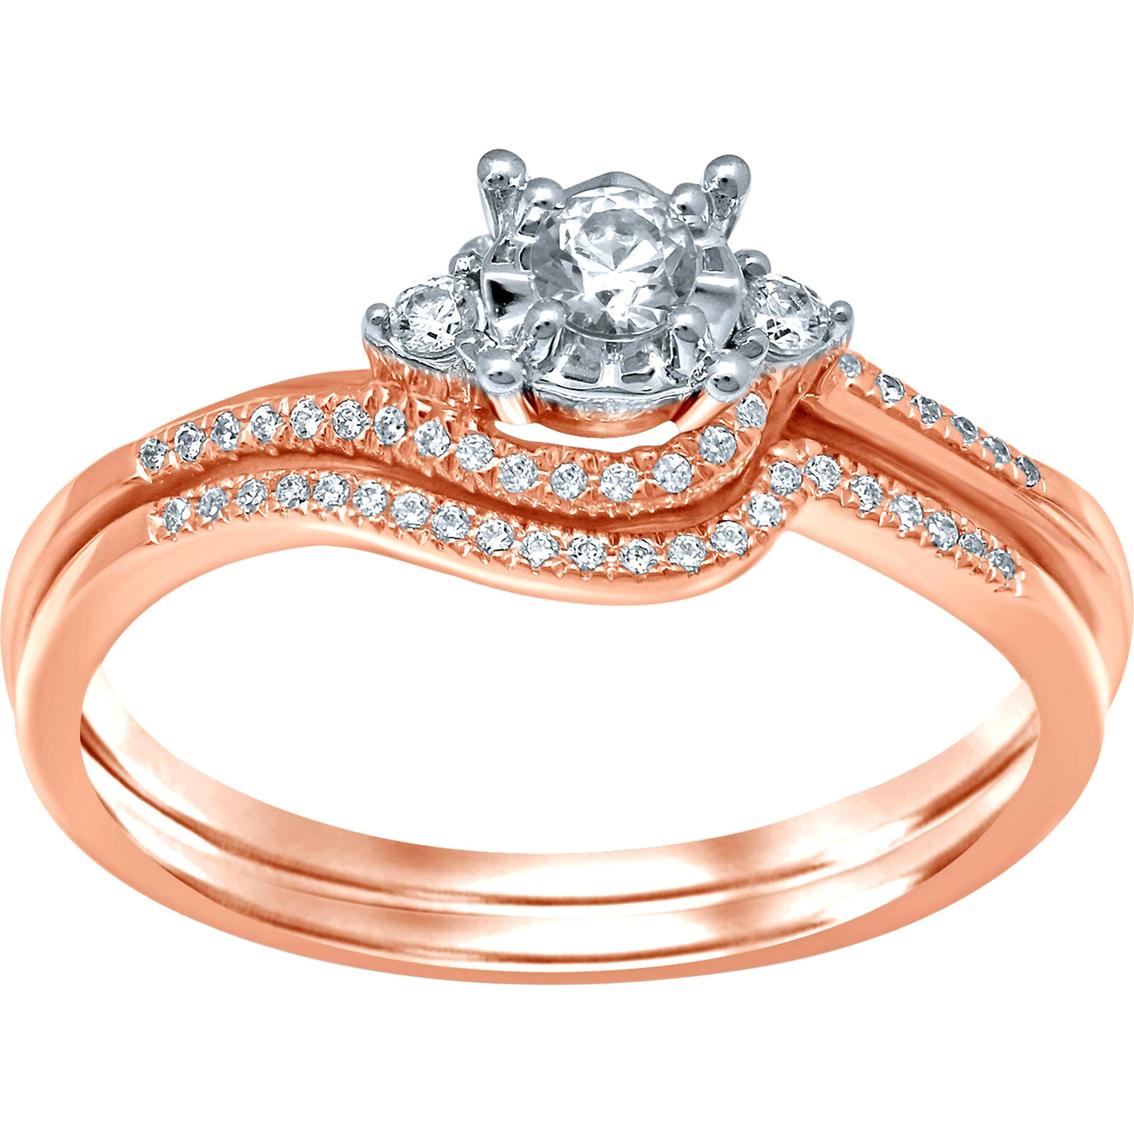 10k Rose Gold 1/4 Ctw Round Center Diamond Bridal Set | Bridal Sets & Trios | Jewelry & Watches ...